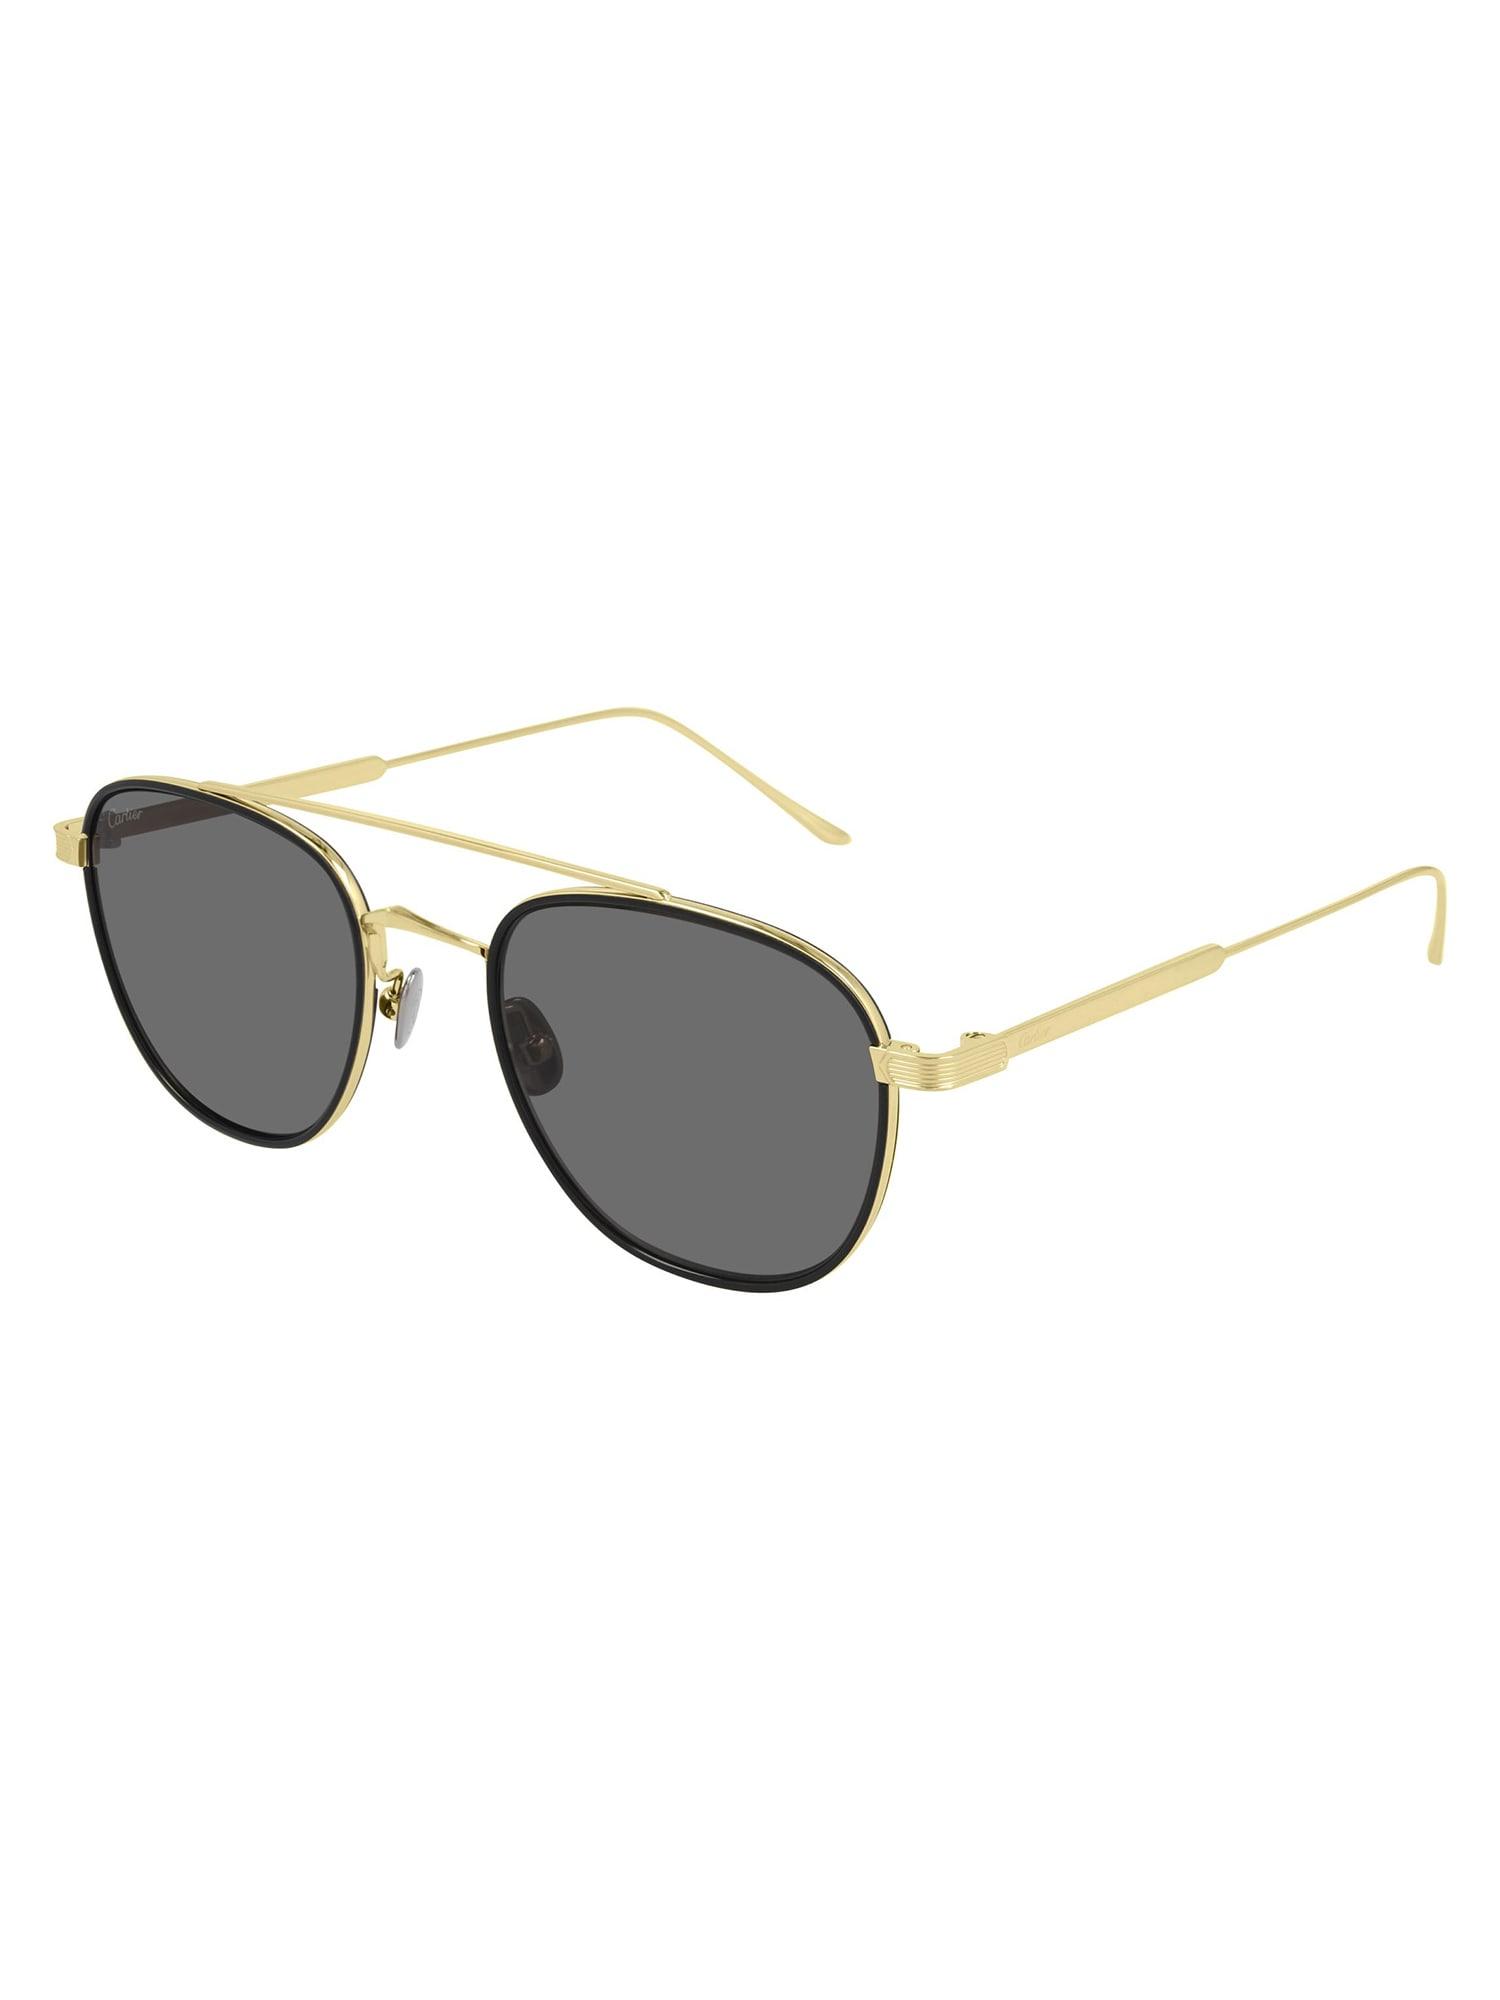 Cartier Eyewear CT0251S Sunglasses